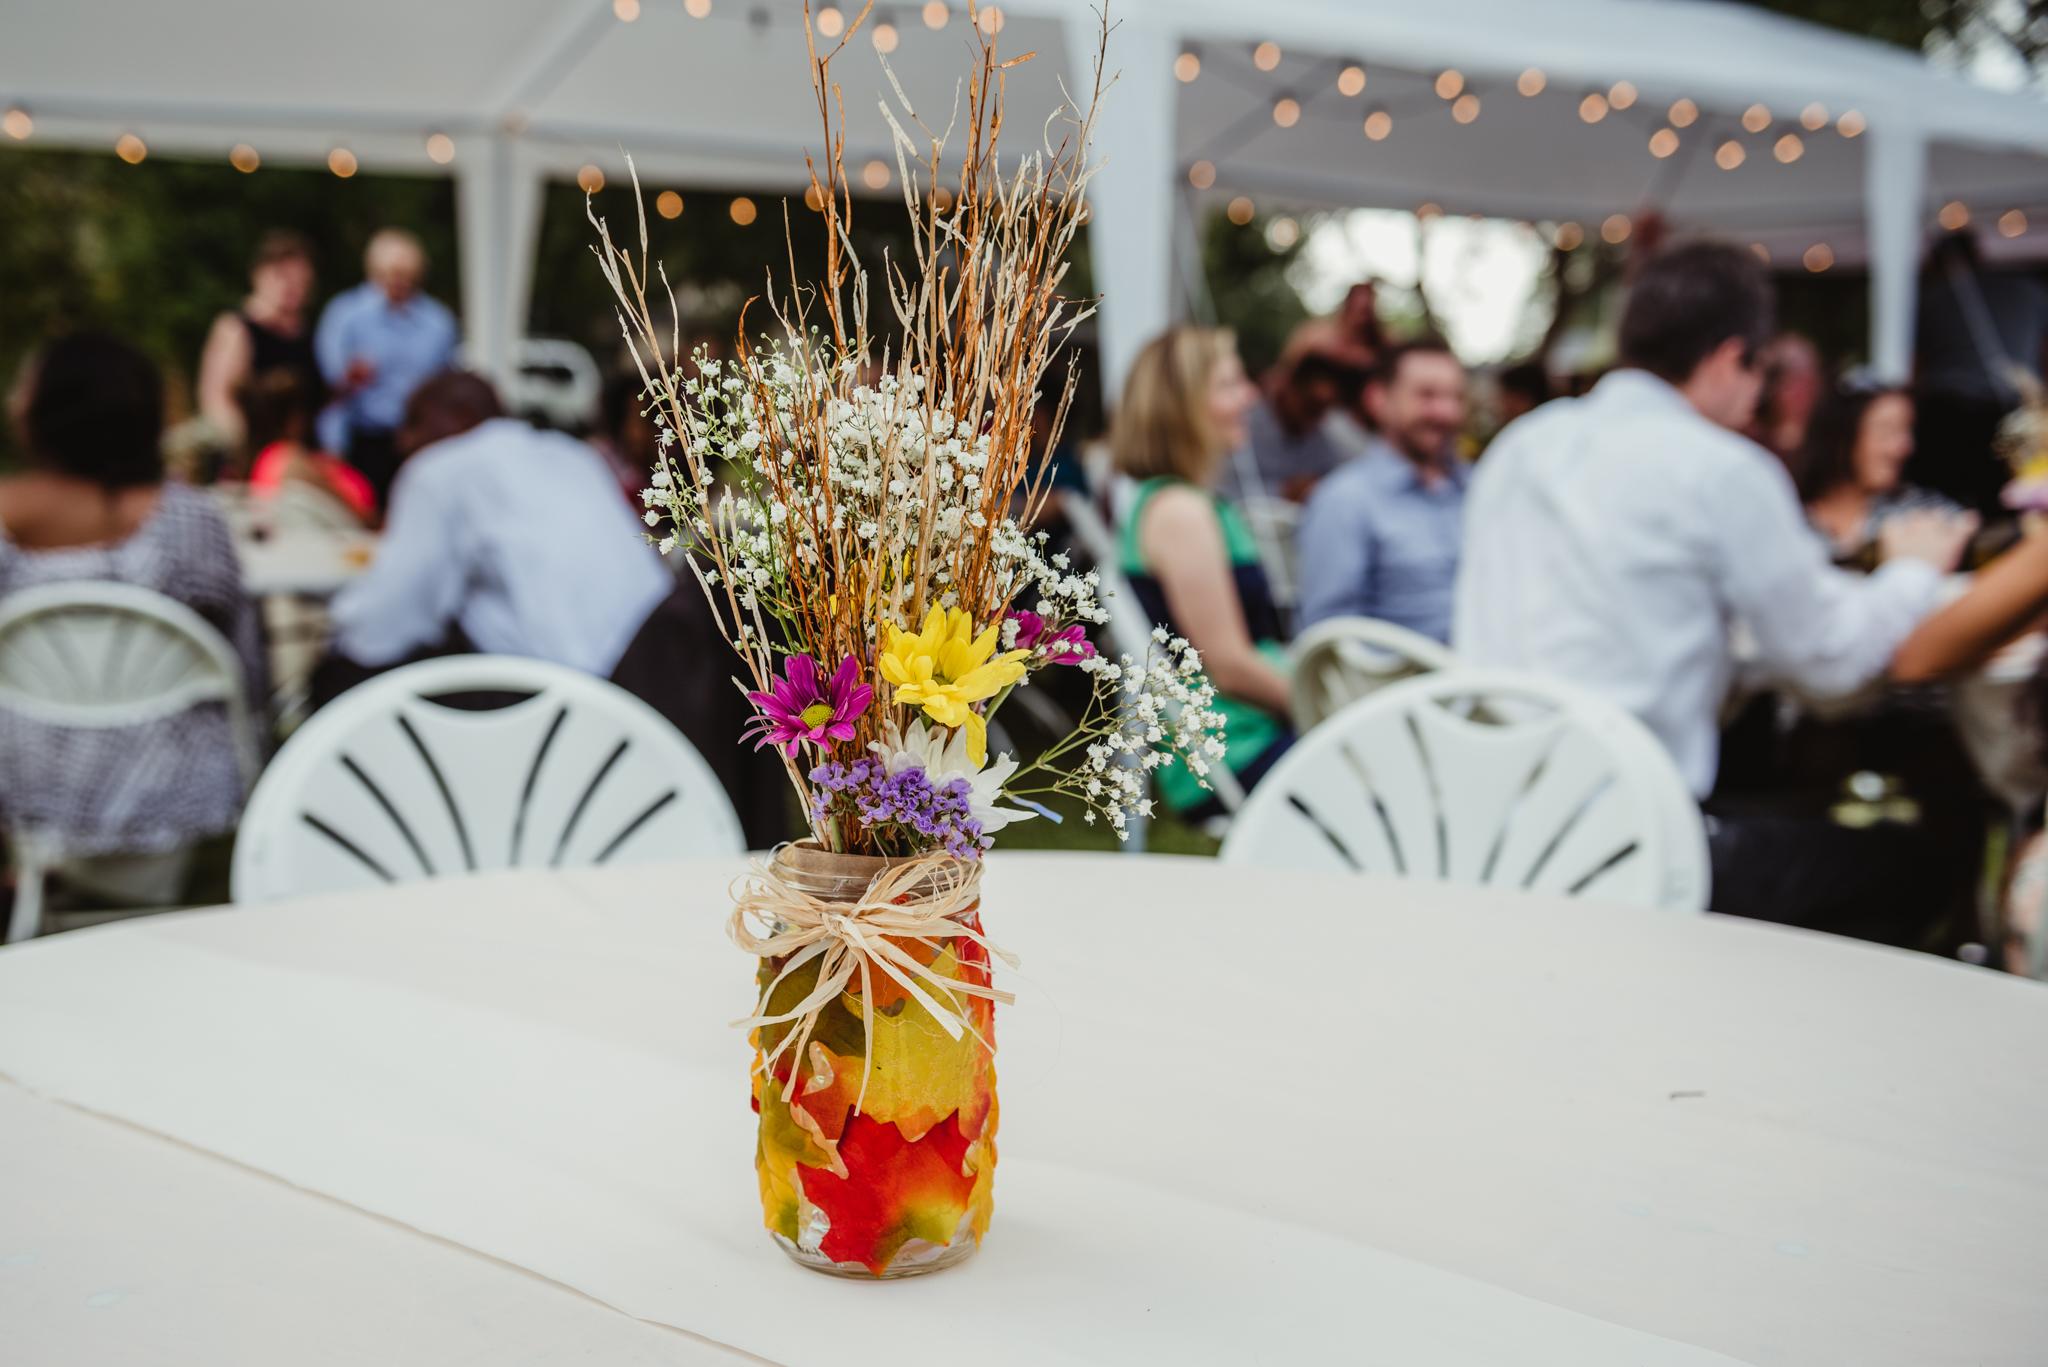 raleigh-wedding-outdoor-reception-details-cd.jpg